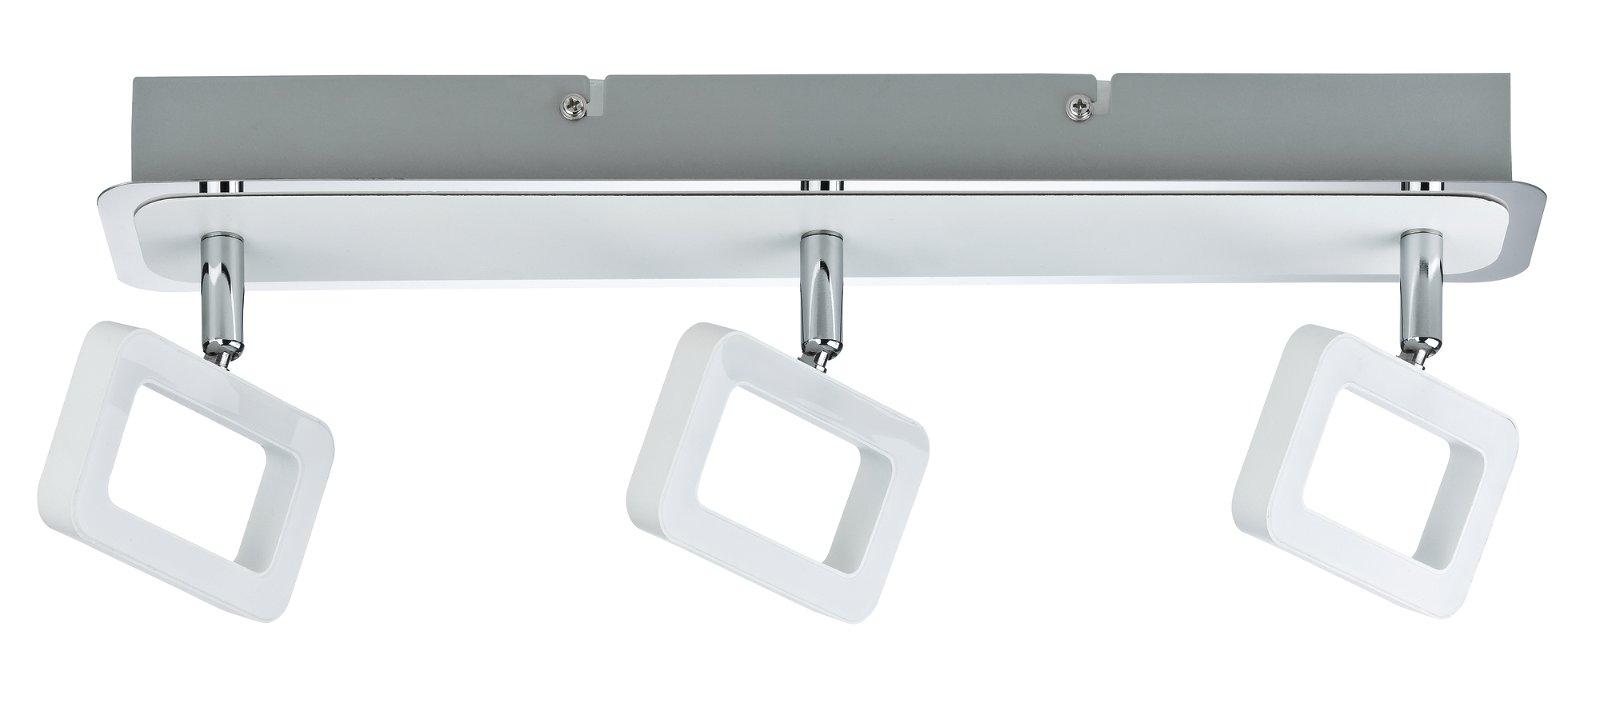 Deckenstrahler Frame 3000K 3x468lm 230V 3x4,5W Weiß matt/Chrom